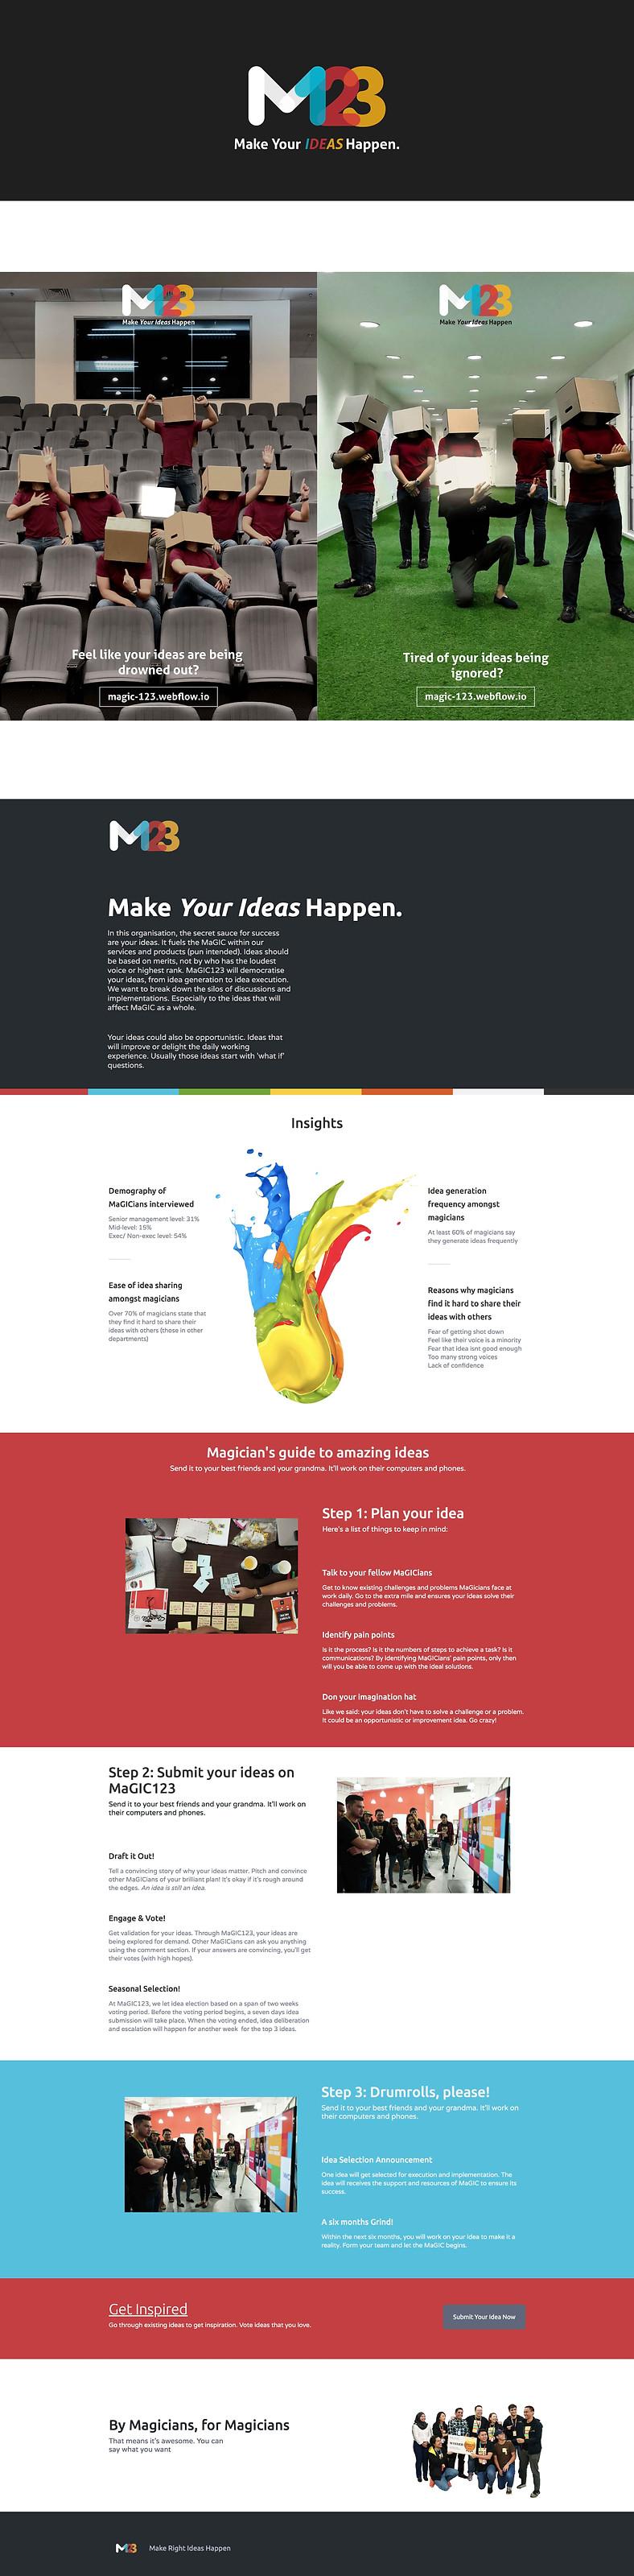 MaGIC123-01.jpg